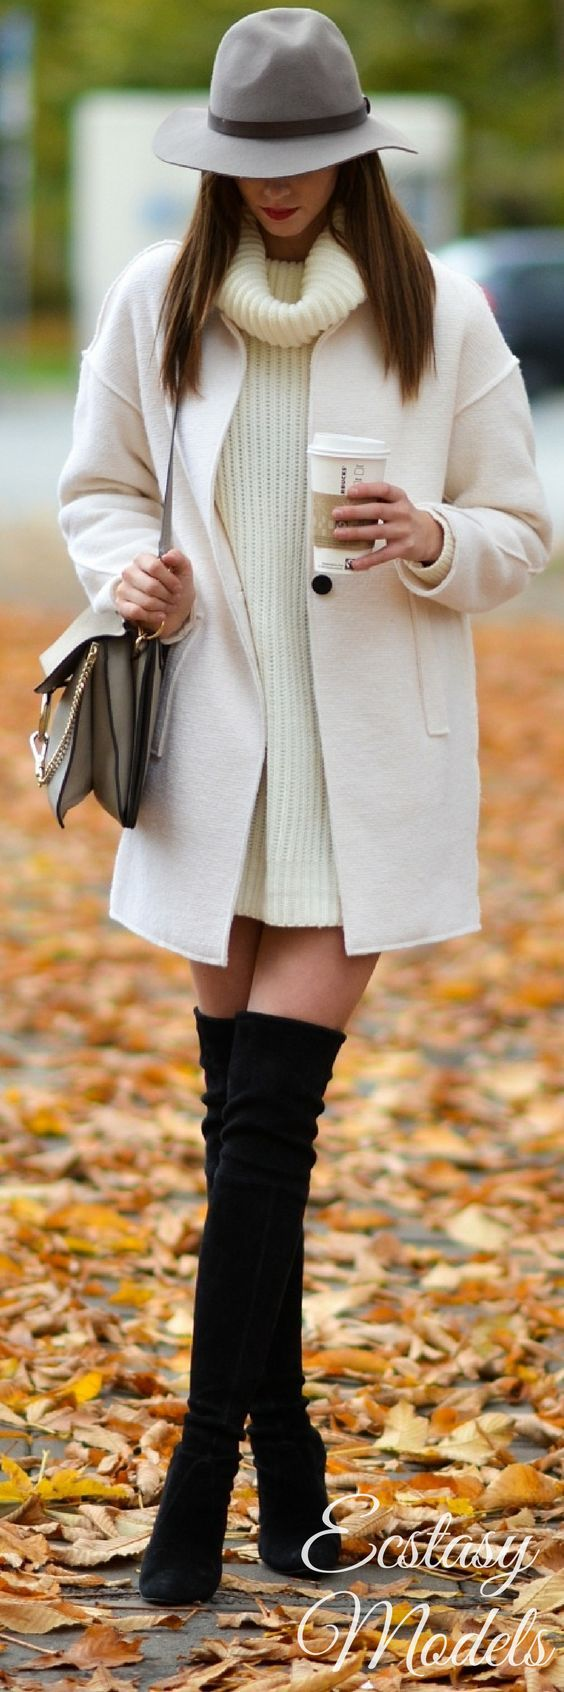 winter fashion knit dress coat